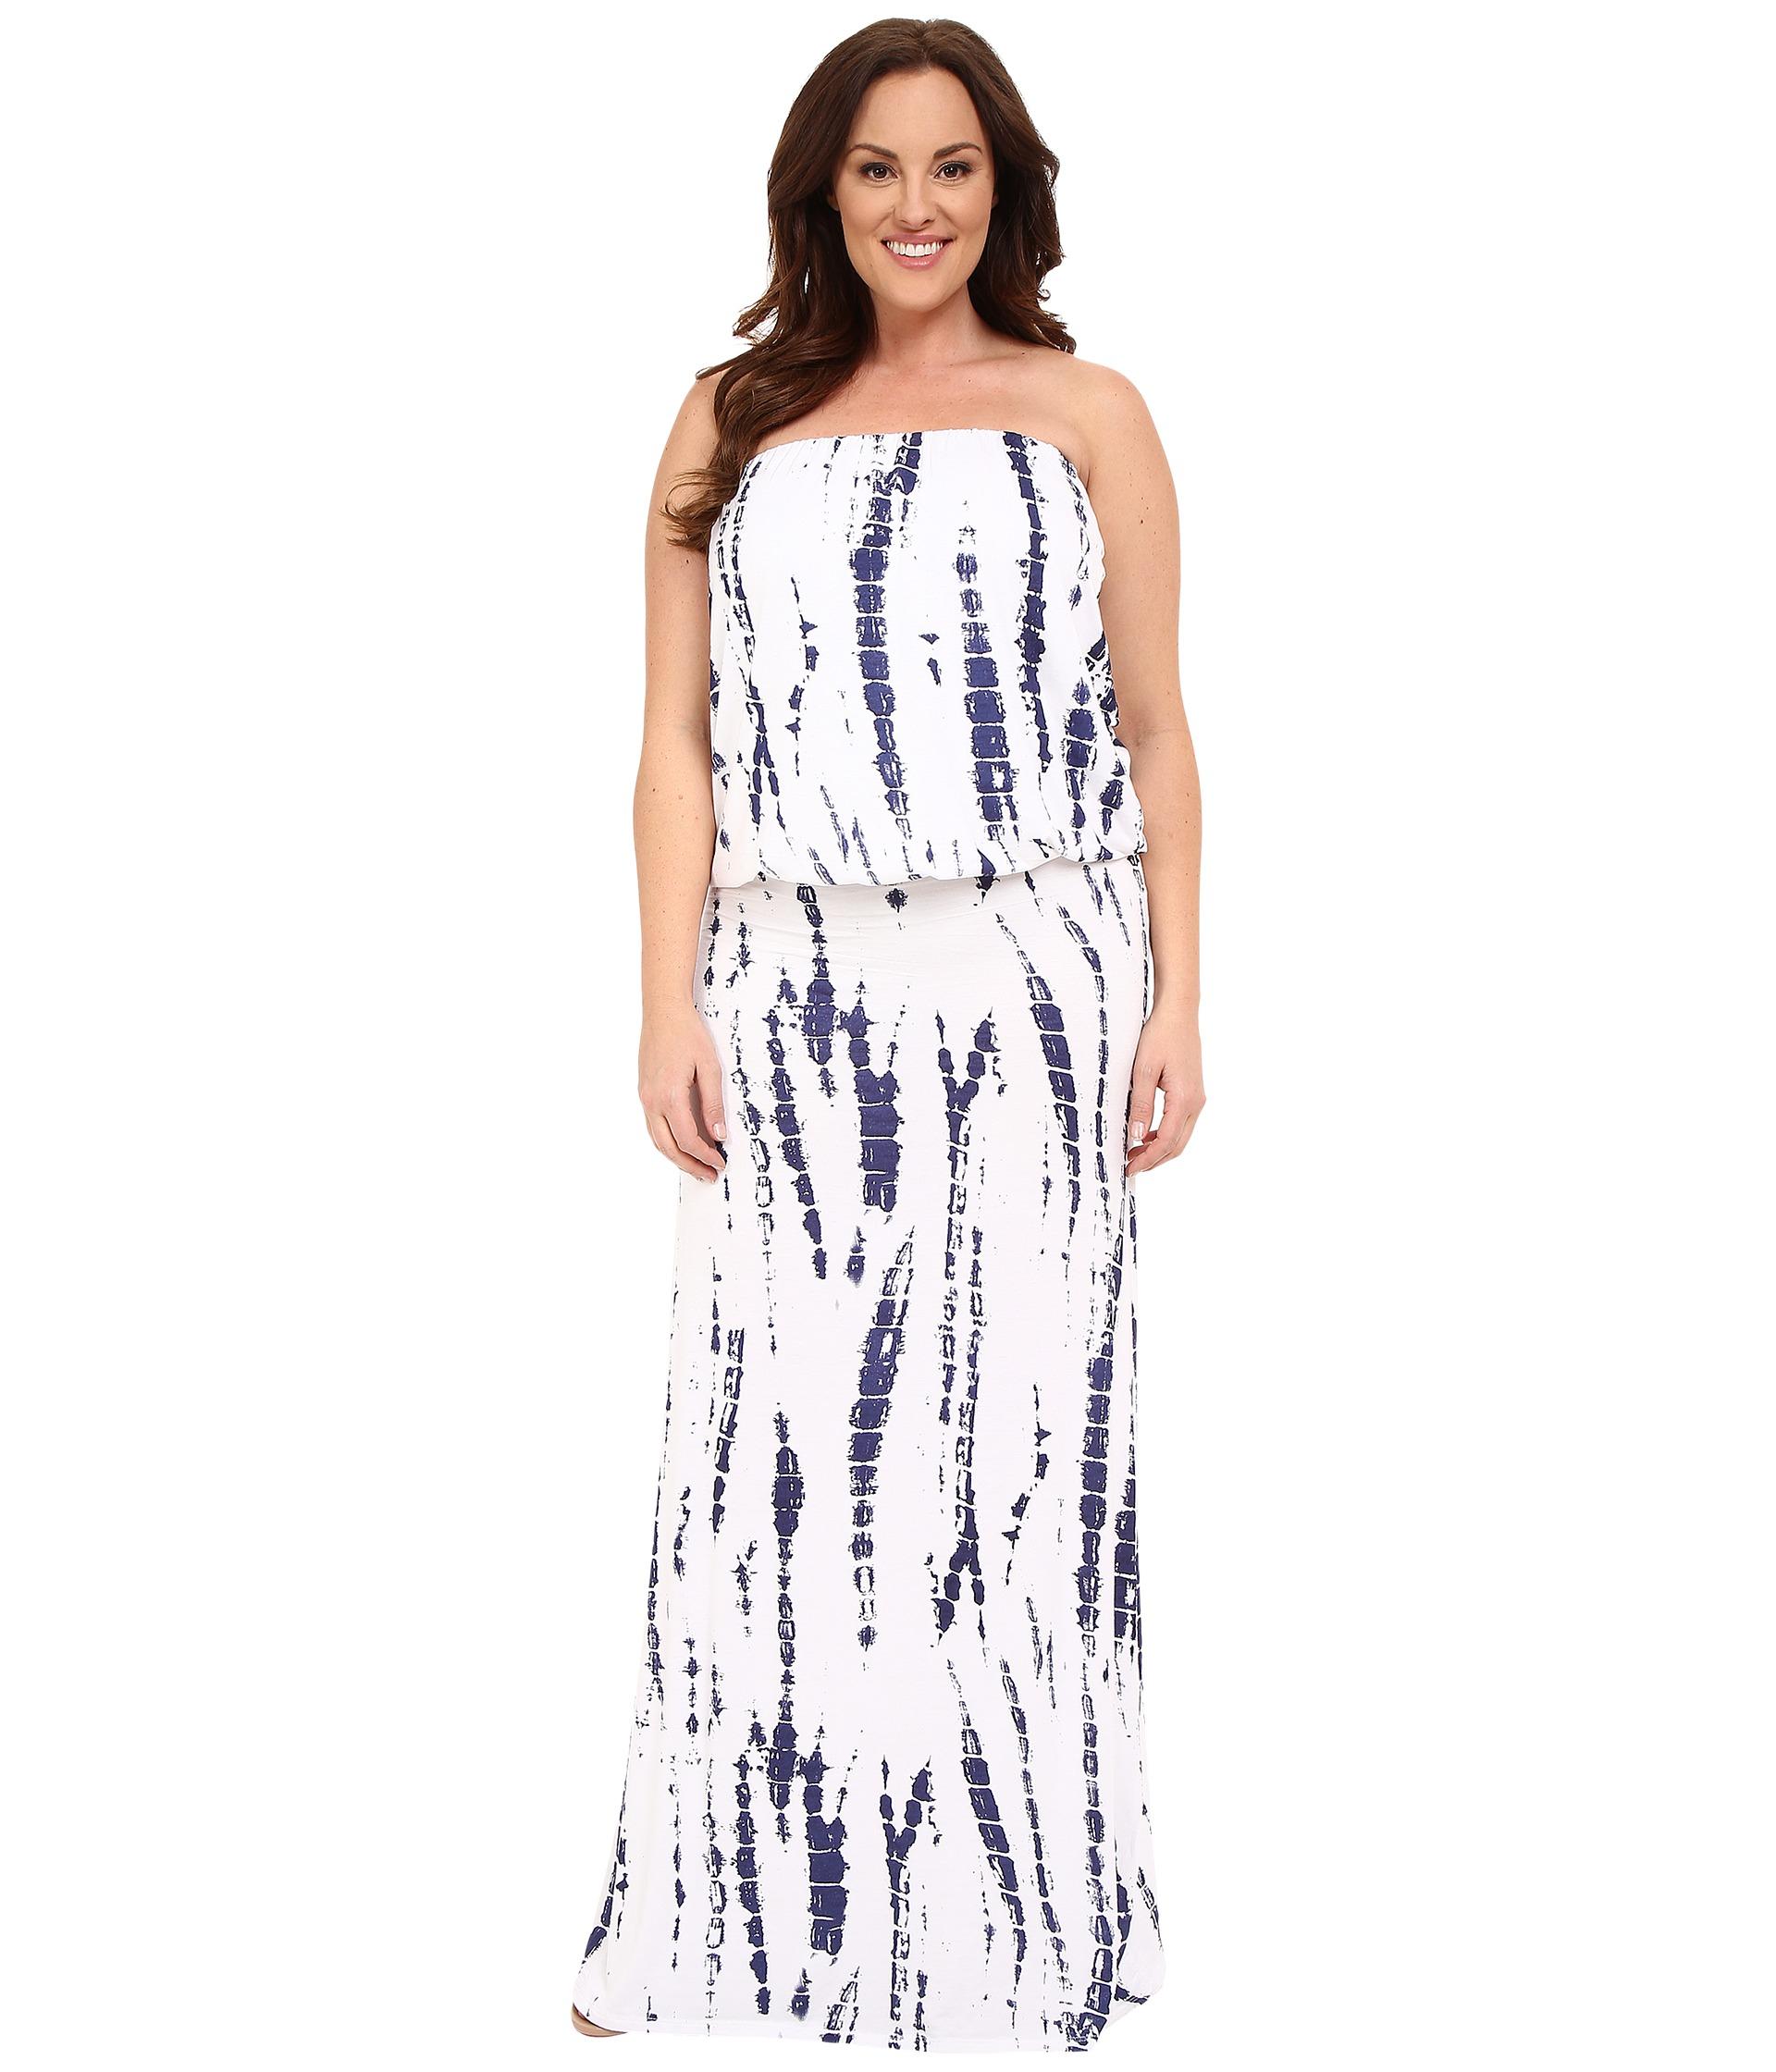 Lyst Culture Phit Plus Size Riena Maxi Dress In White